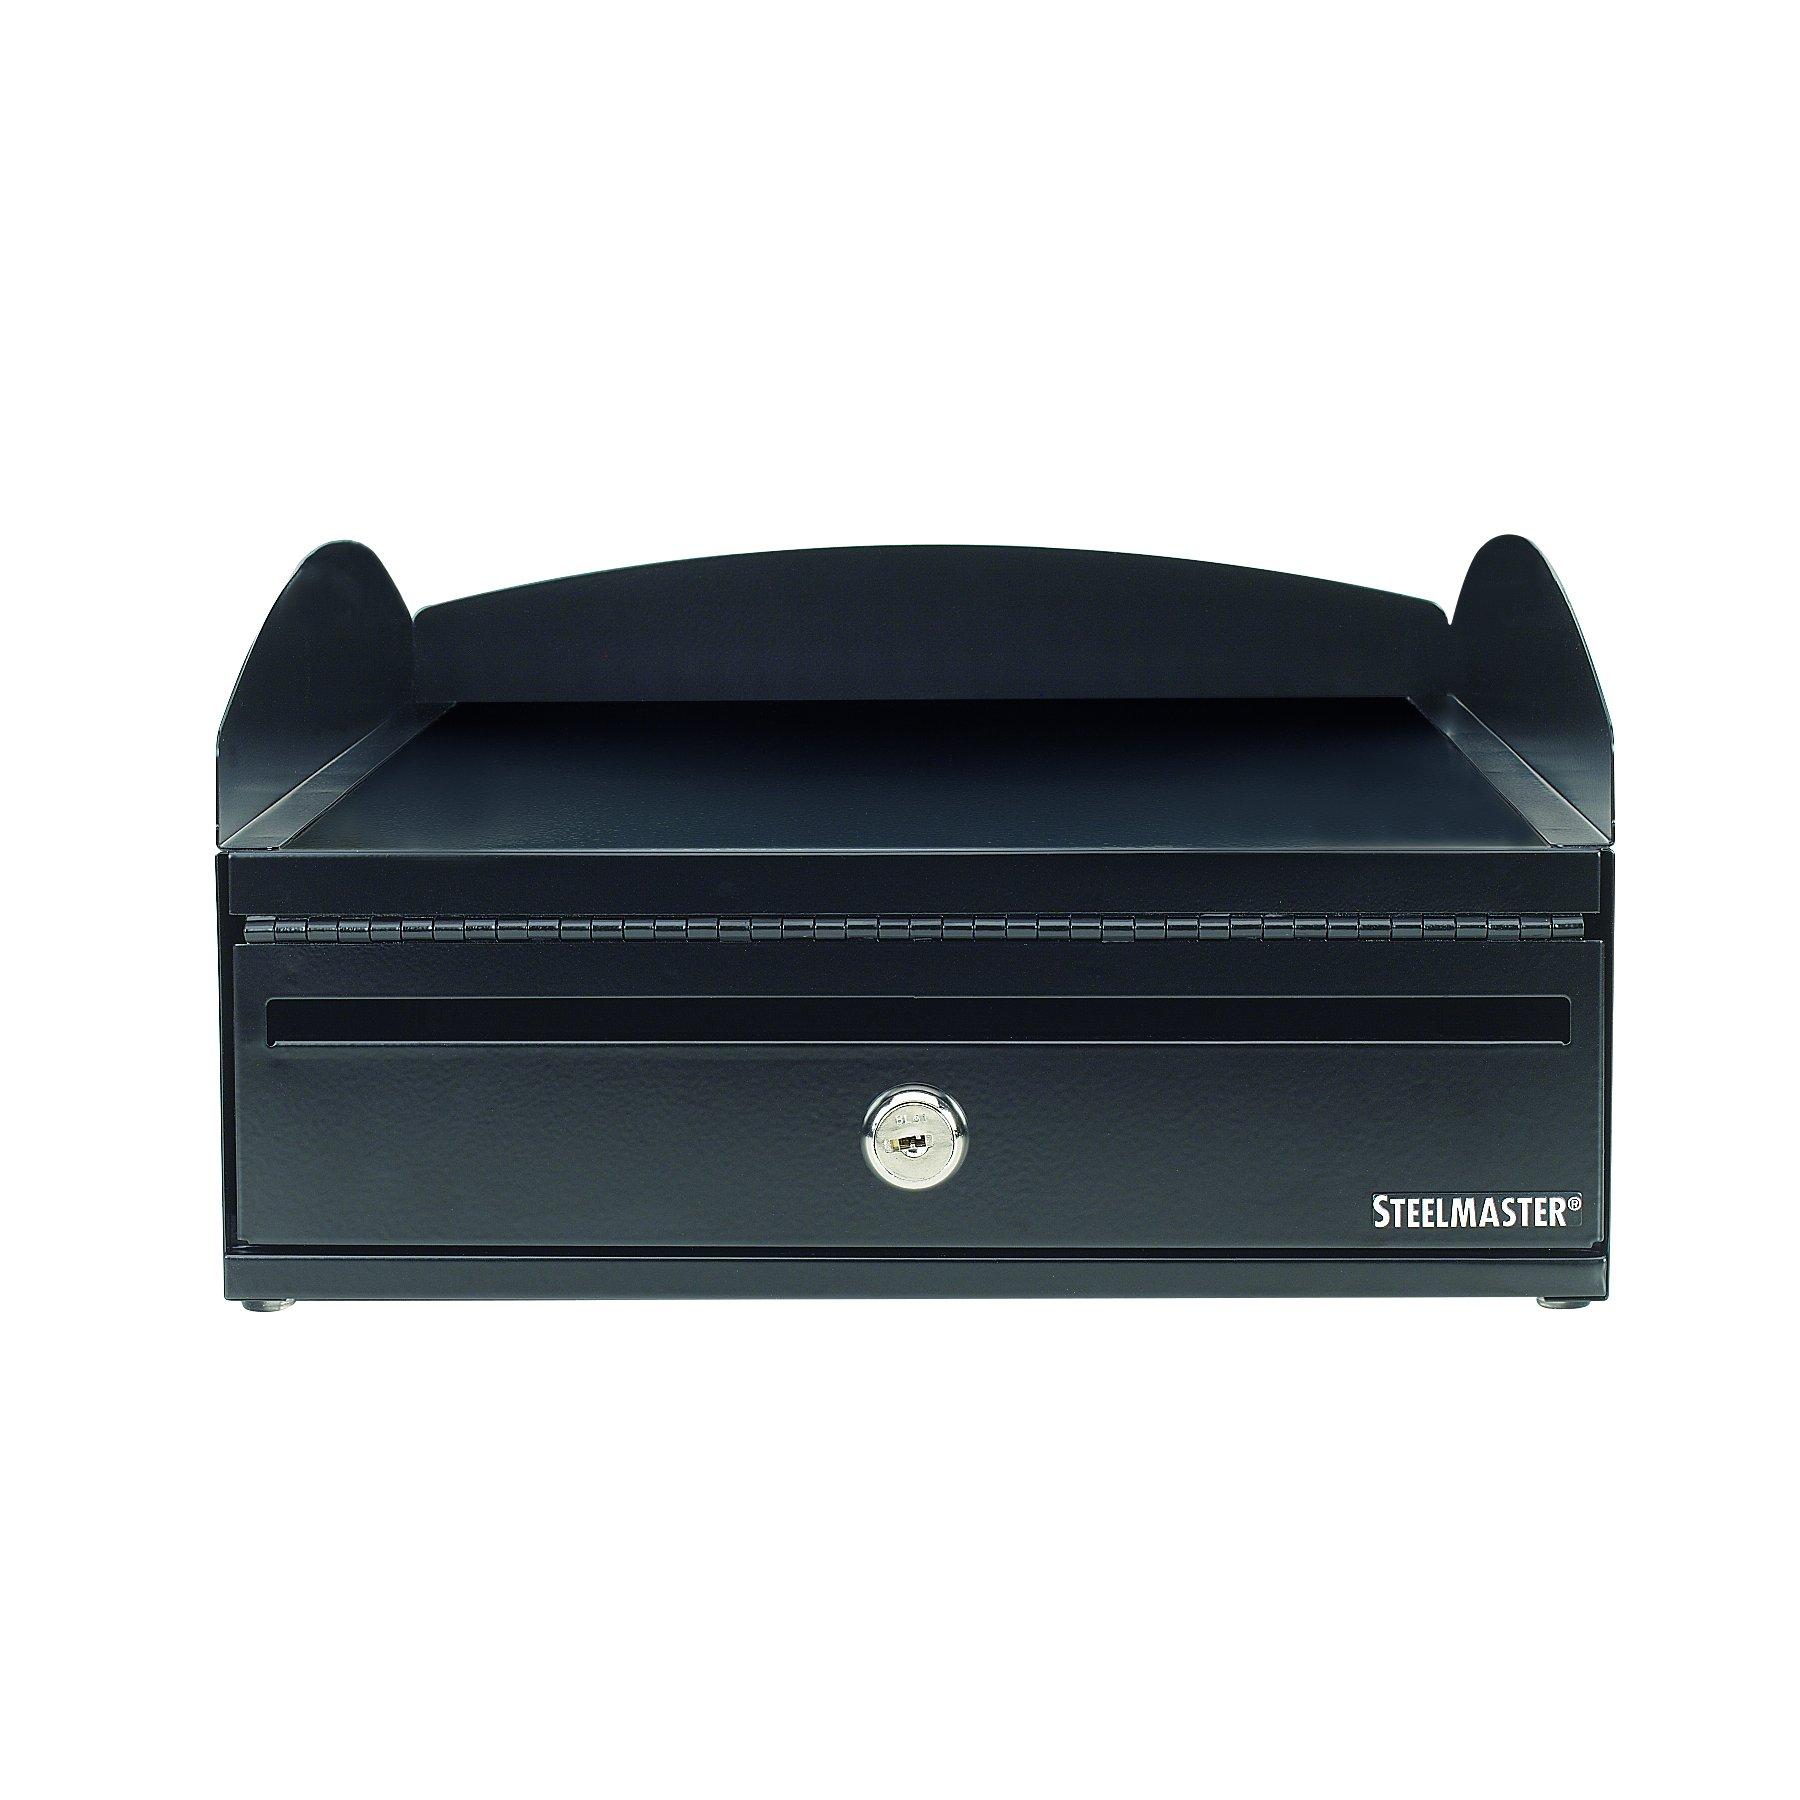 STEELMASTER LockIt Desktop Inbox, 14.5 x 5.75 x 11 Inches, 2 Keys Included, Black (264657004) by MMF Industries